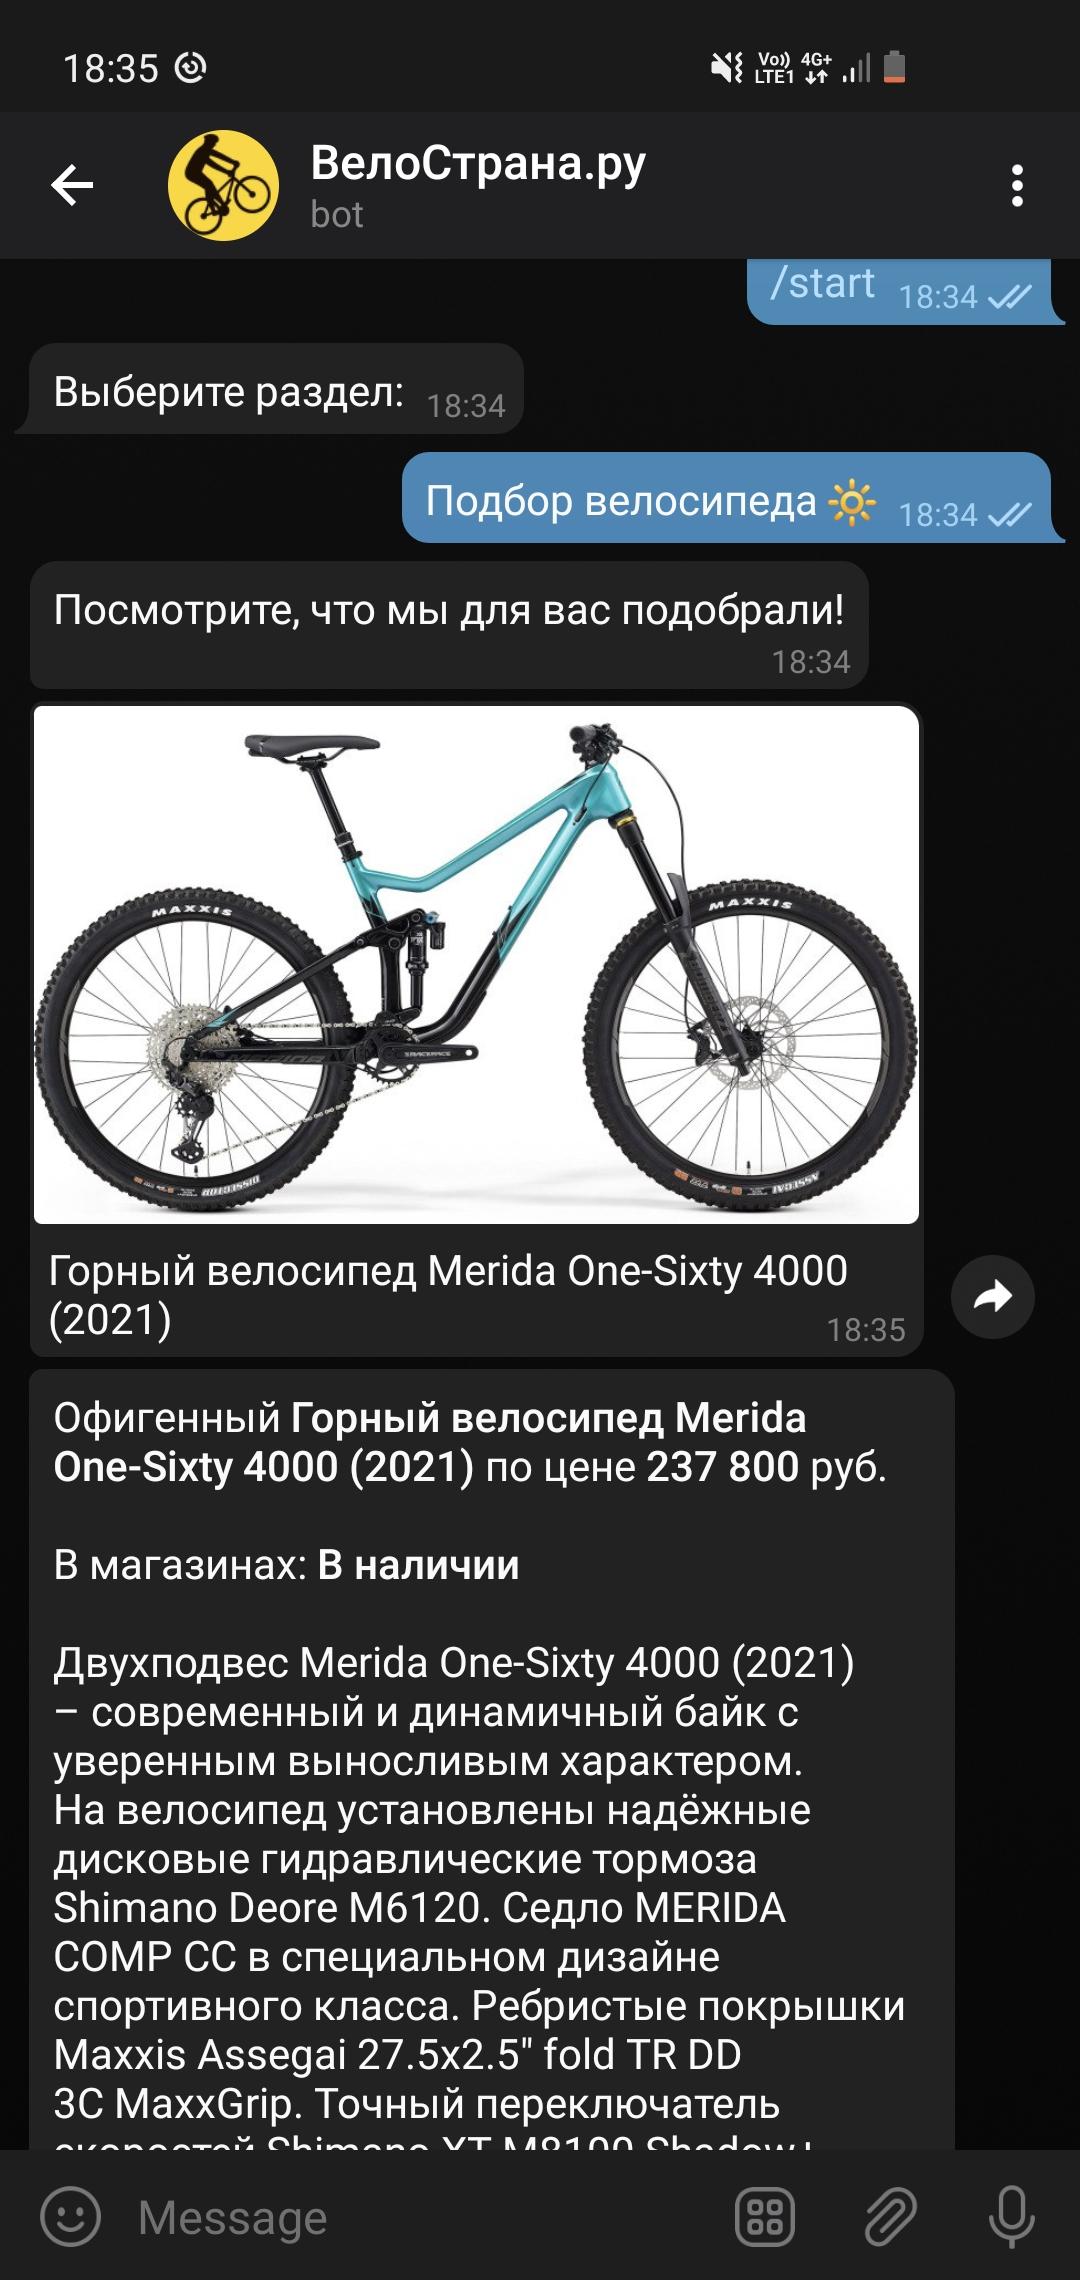 Screenshot-20210408-183529-Telegram.jpg